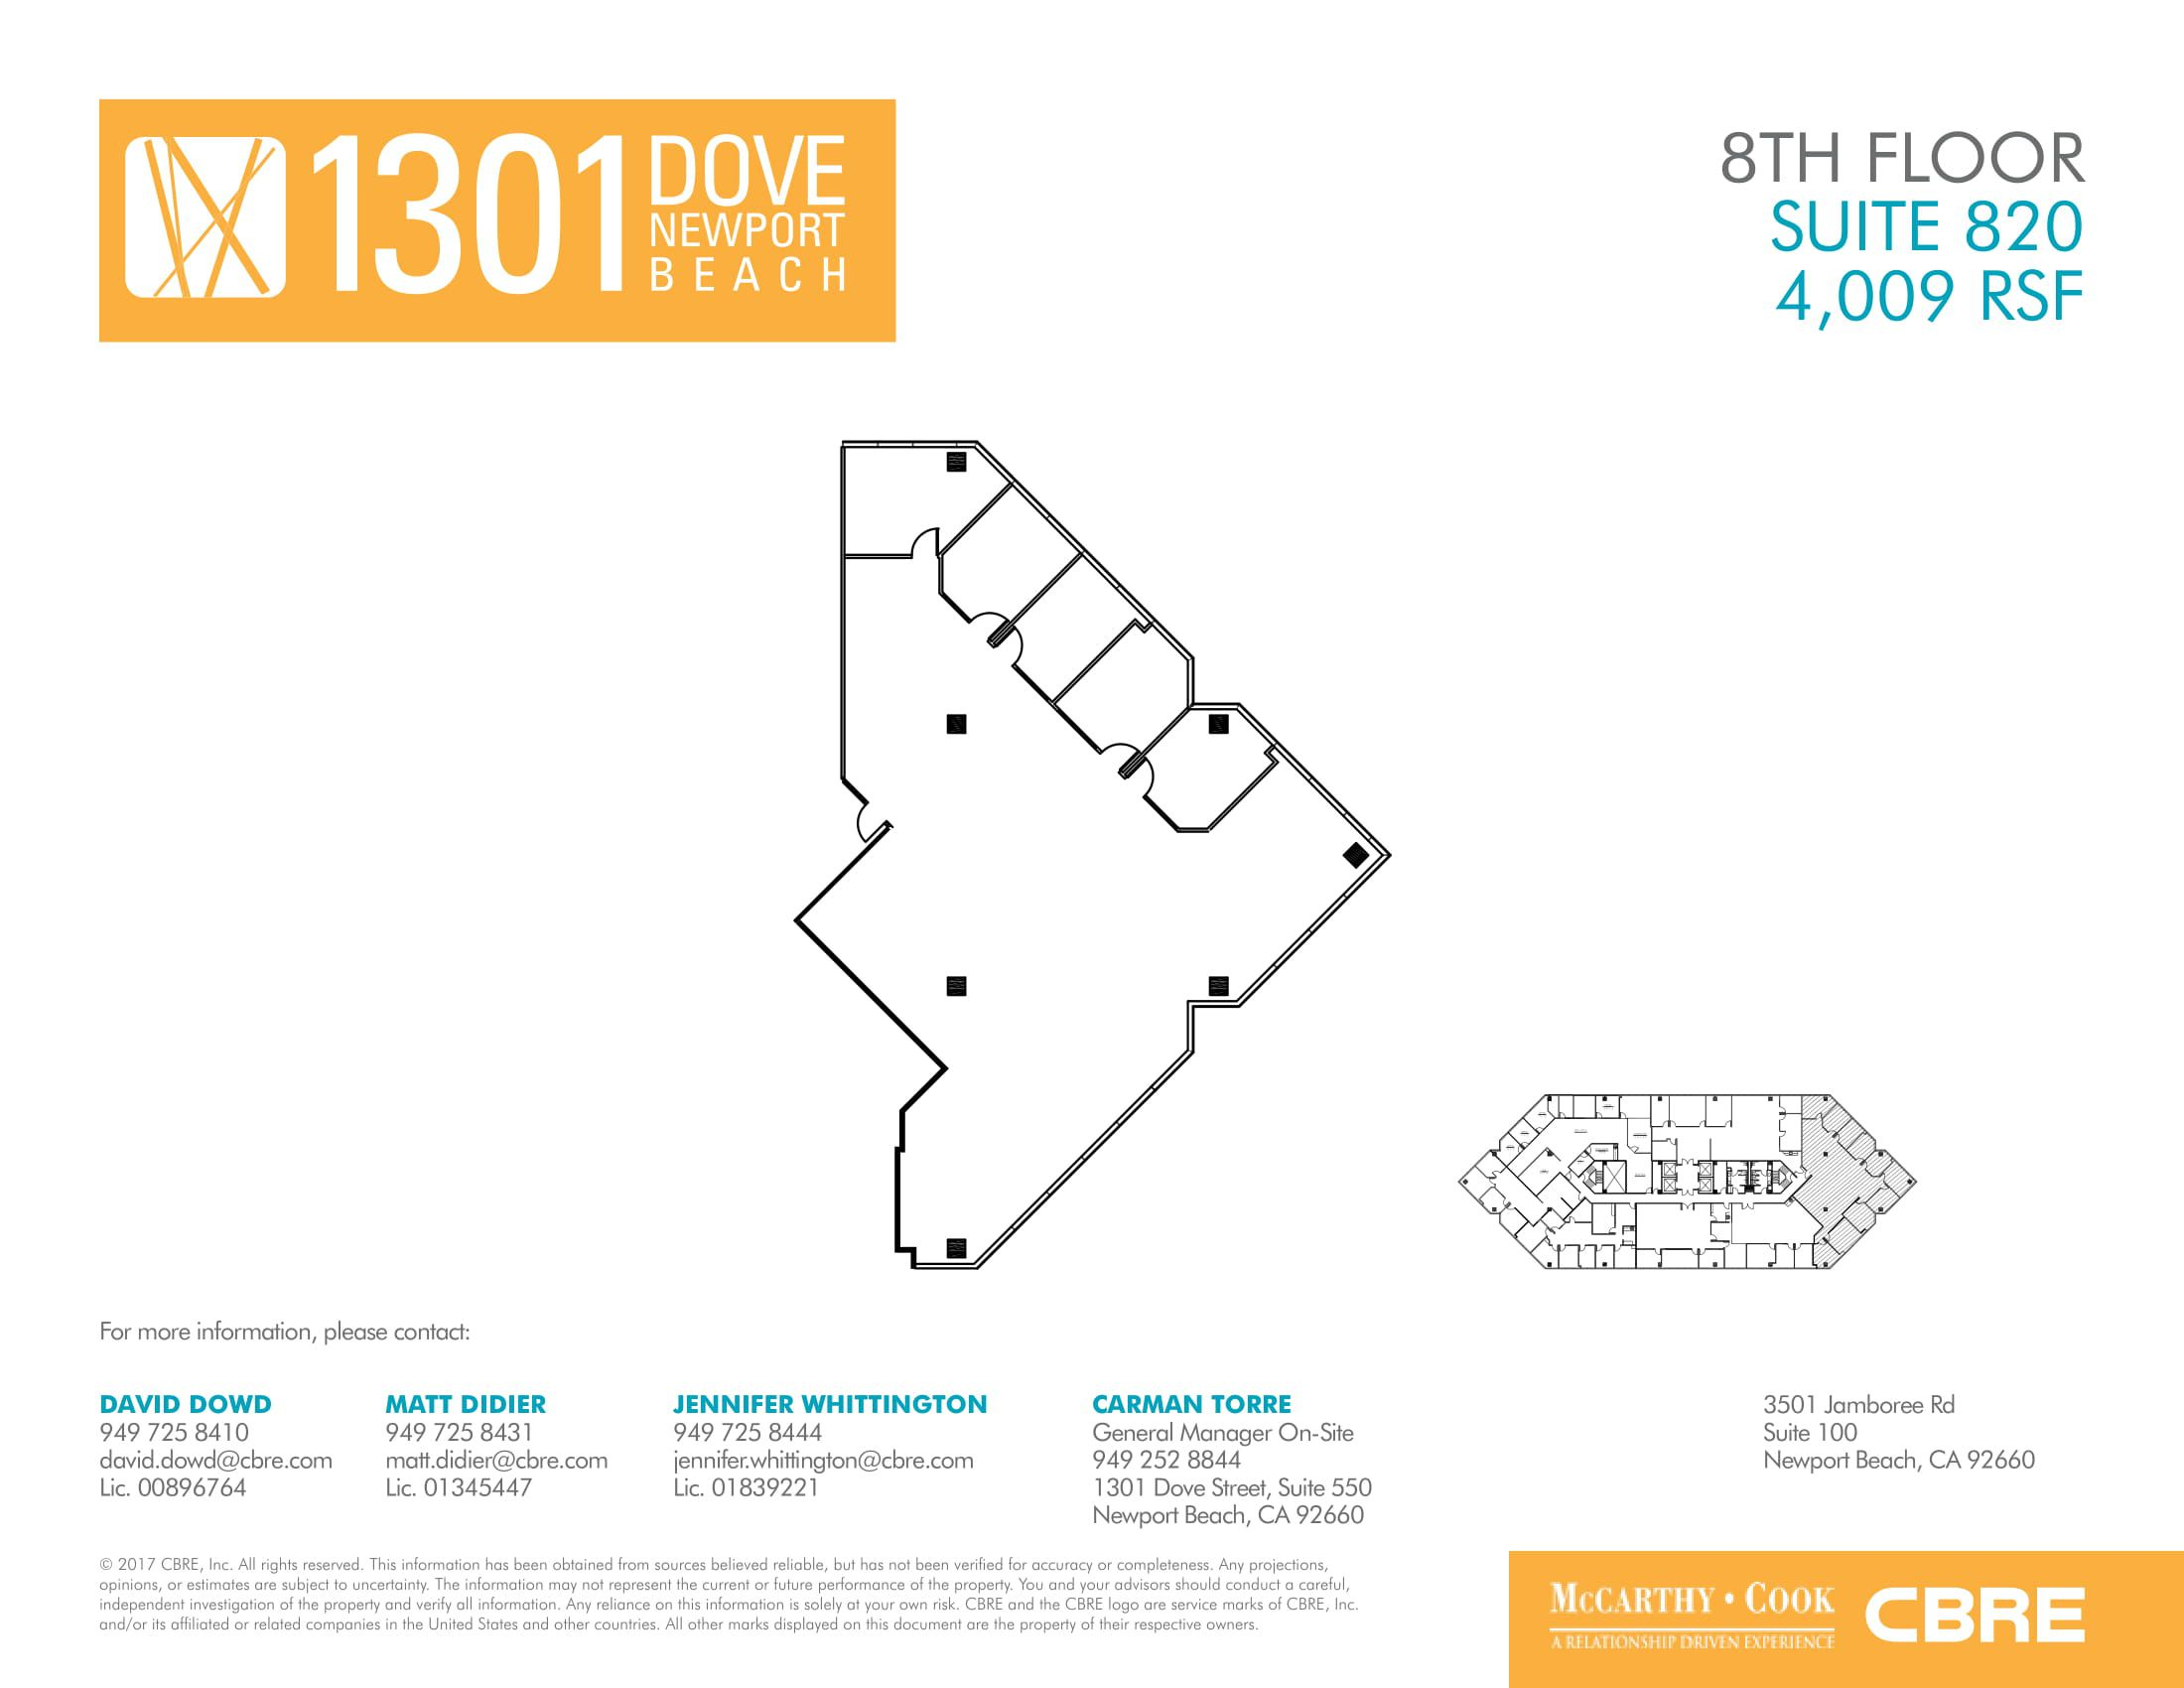 8th floor 820 floor plan.jpg